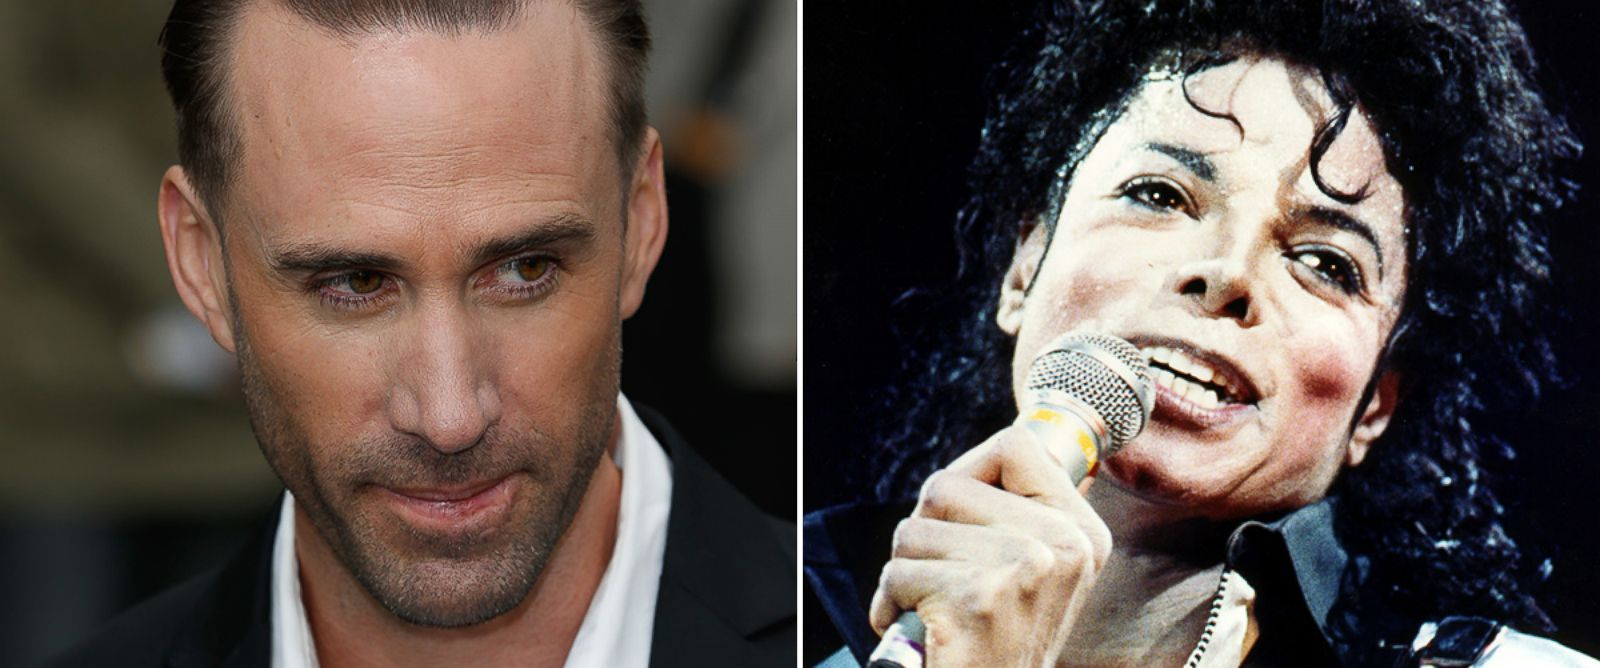 PHOTO: Joseph Fiennes and Michael Jackson.